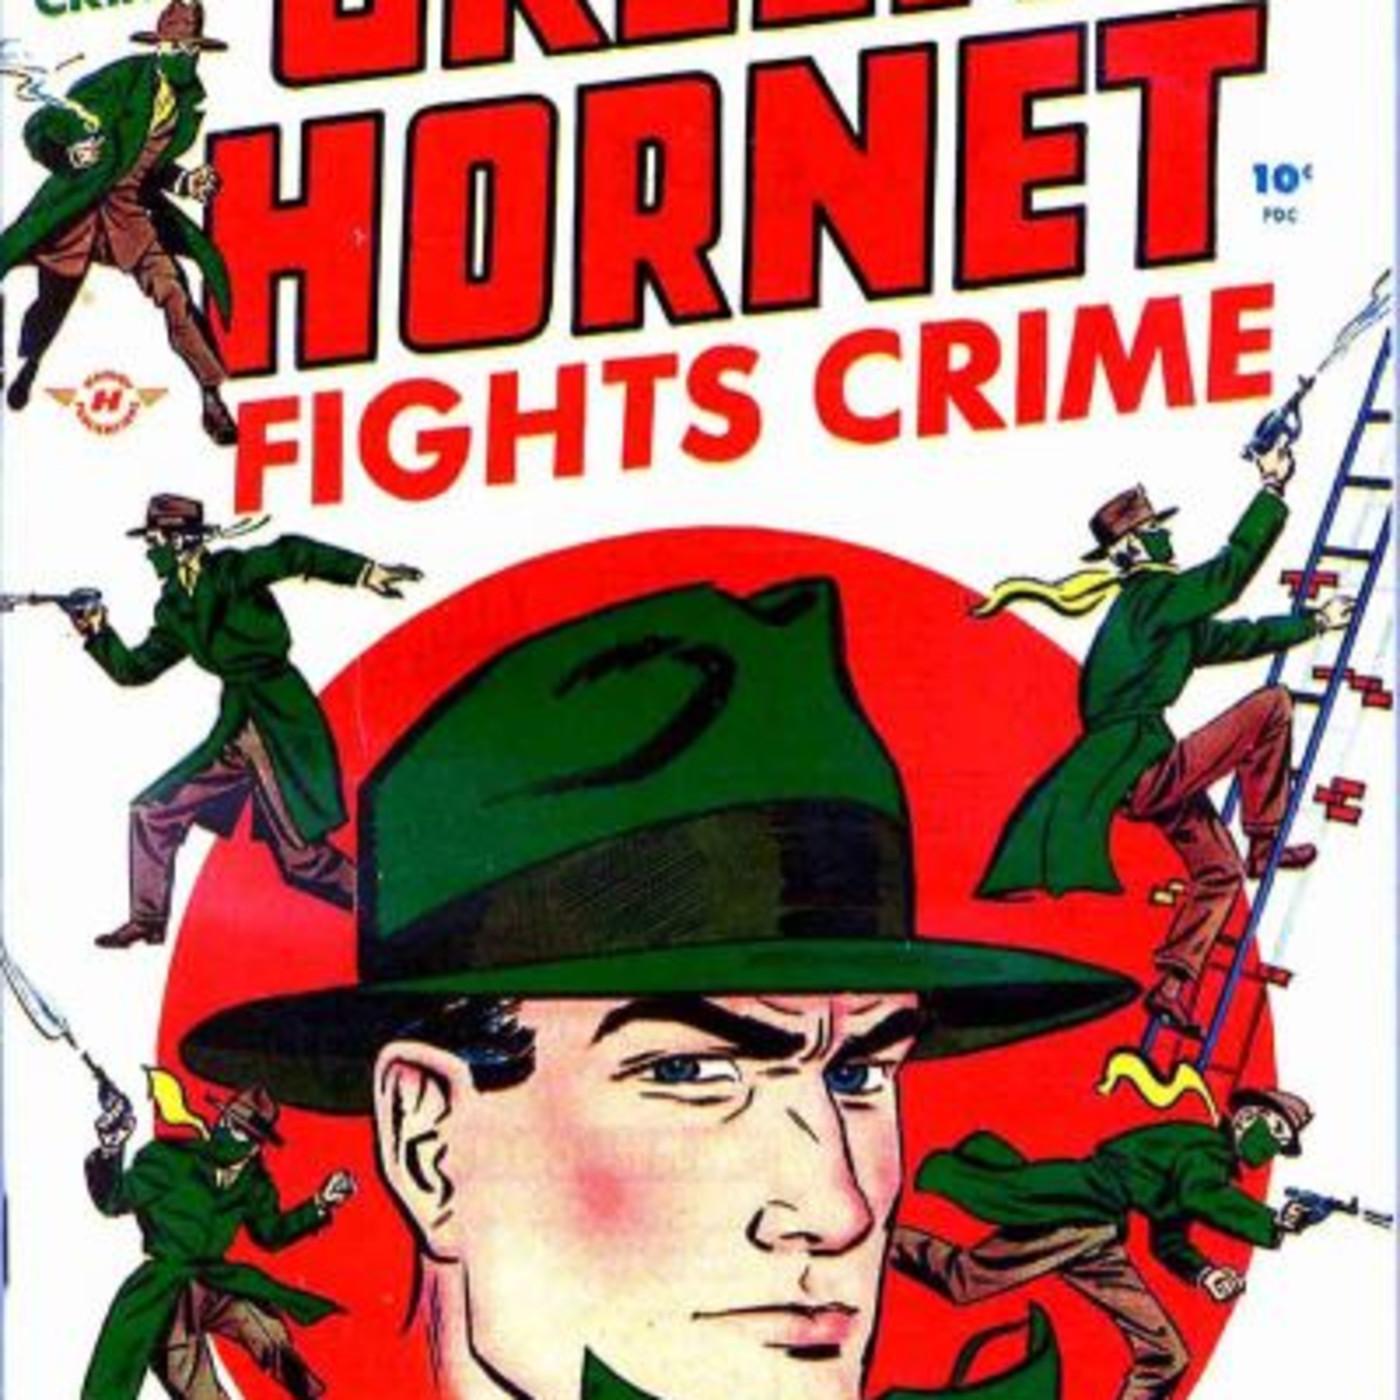 The Green Hornet - 00 - 440611 The Hornet Does It.mp3